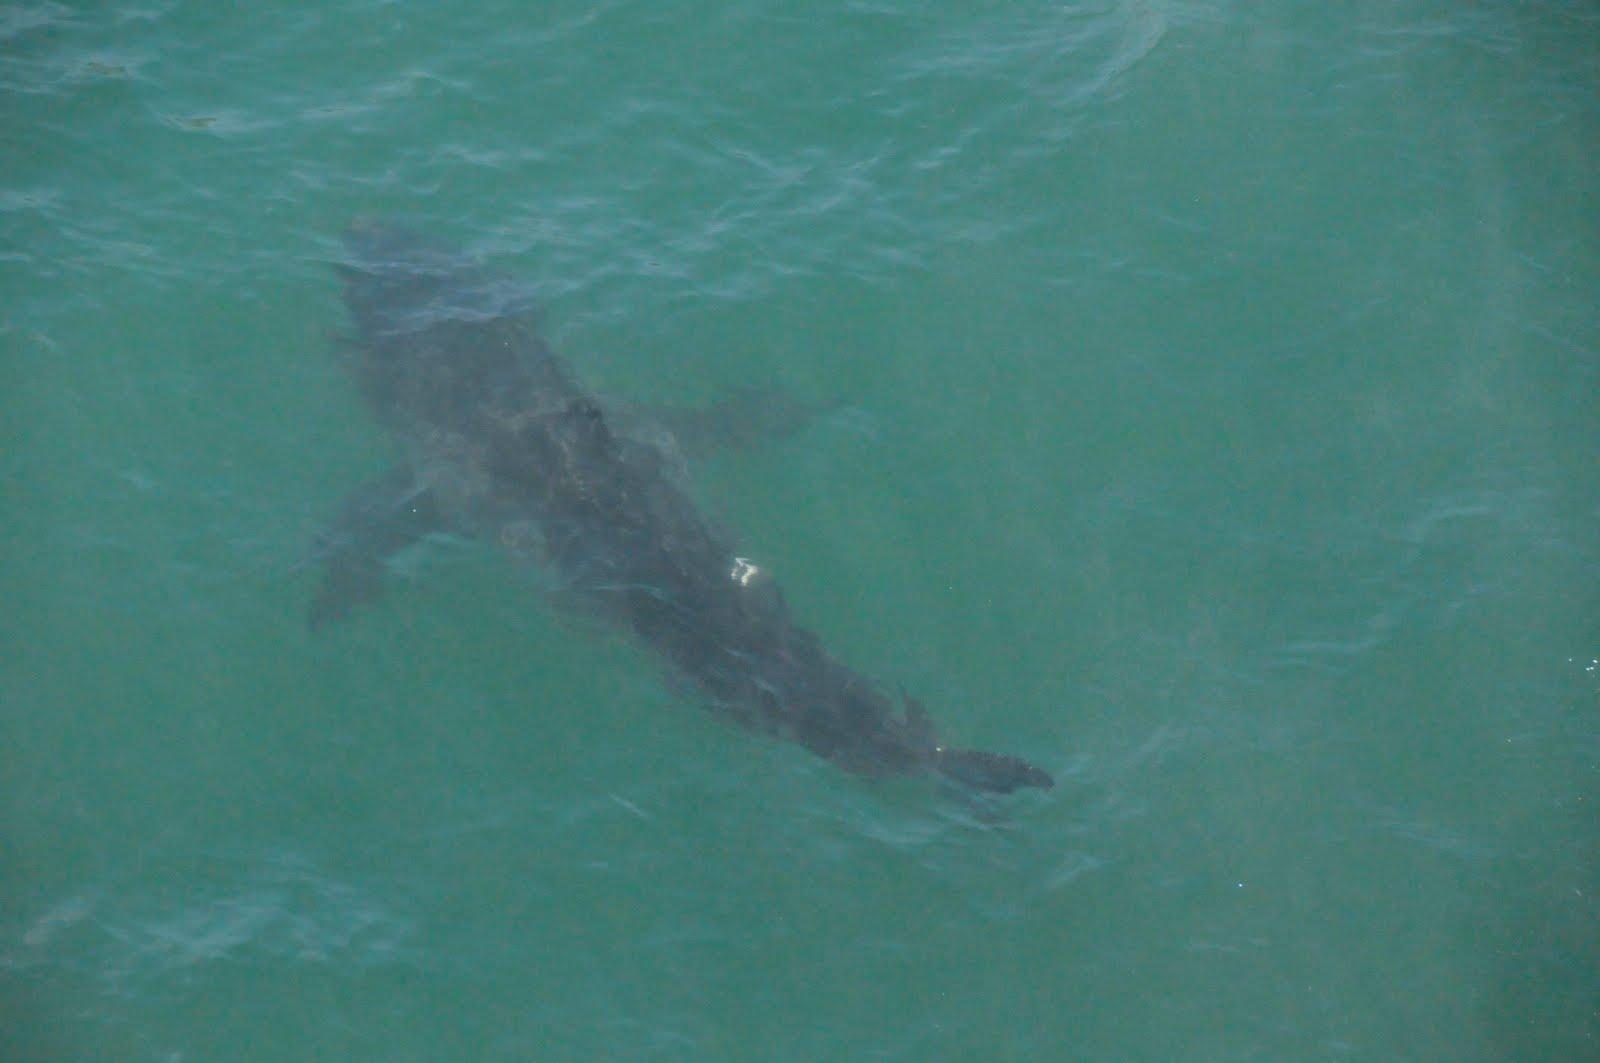 Shark eating helicopter